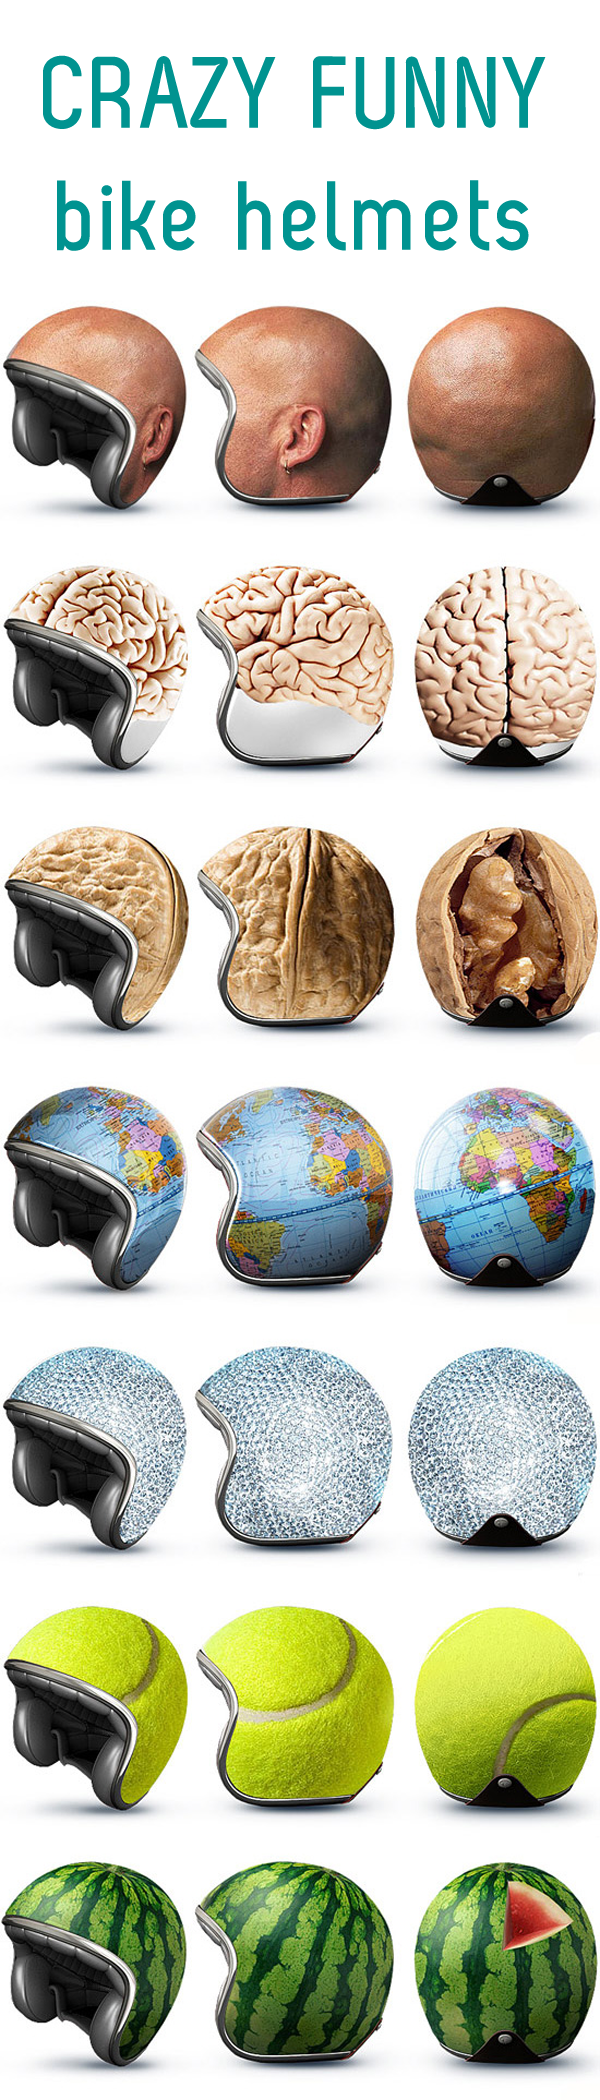 funny bike helmets